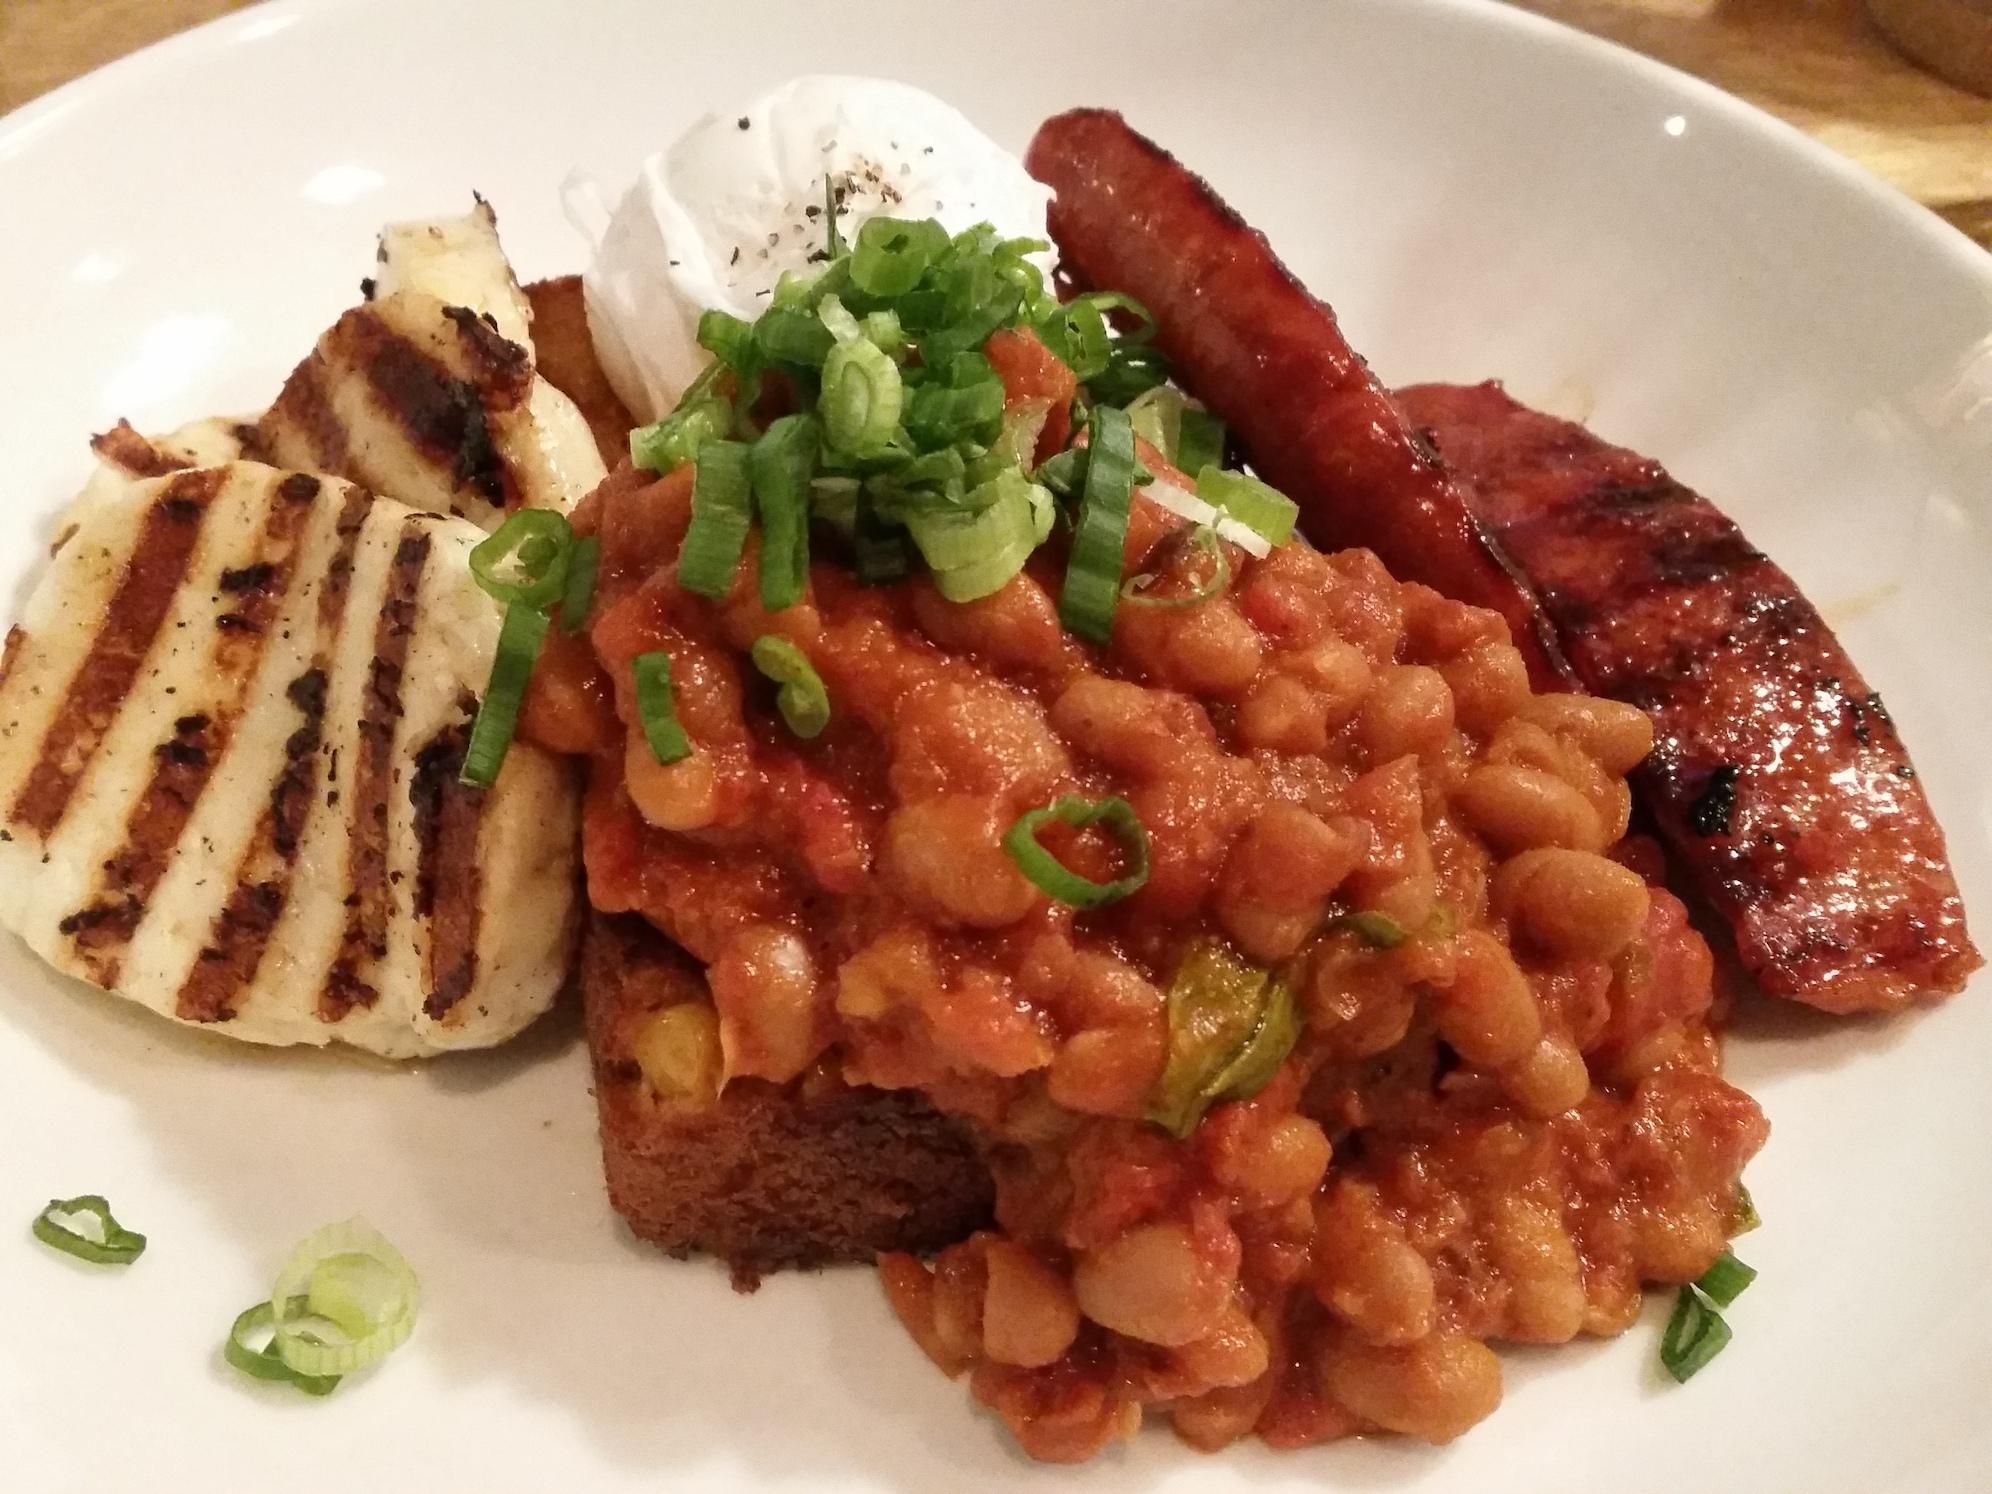 Lori's slow & low baked beans (with halloumi) at Lantana, Shoreditch